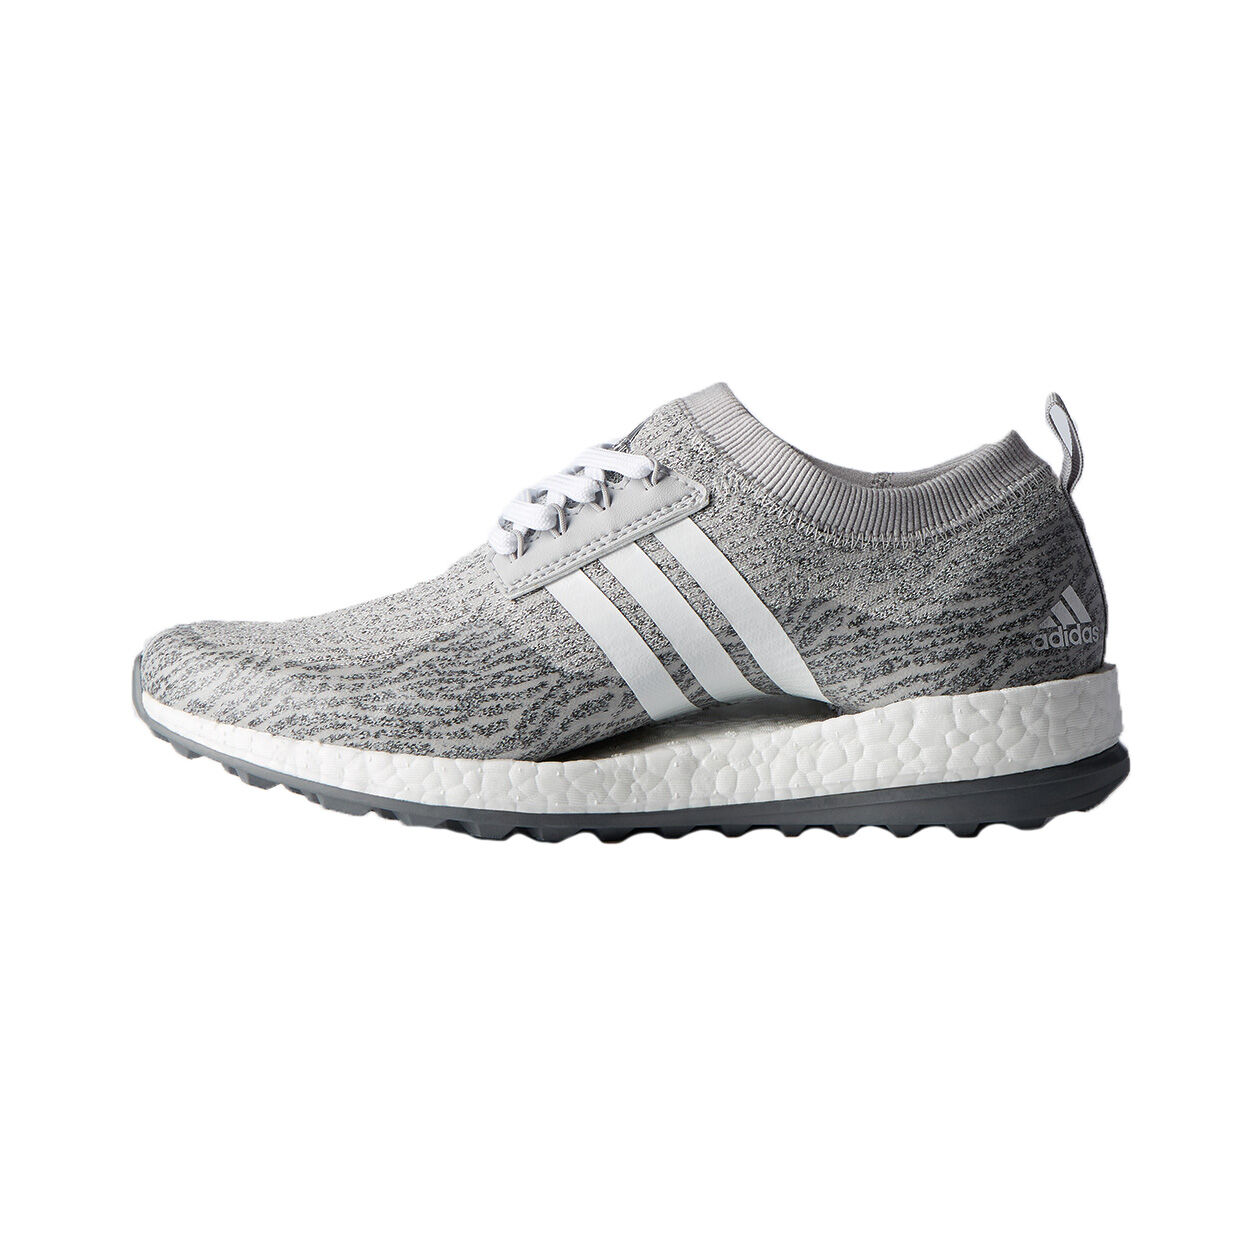 adidas Pure Boost XG Women's Golf Shoe - Grey/White